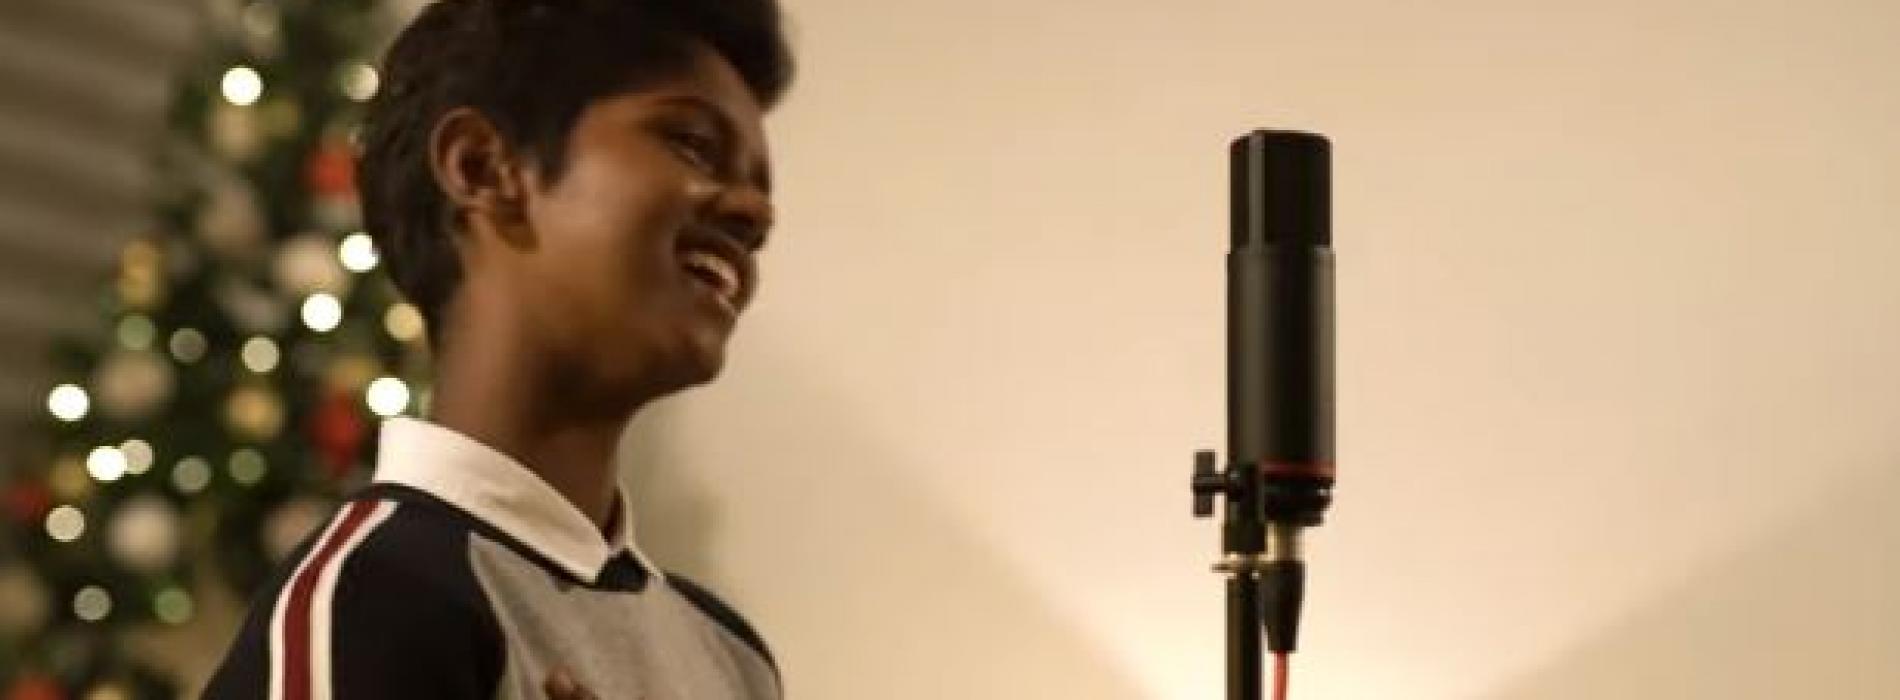 New Music : 'That's Christmas To Me' (Pentatonix Cover) – Jevahn Mikel Sathasivam